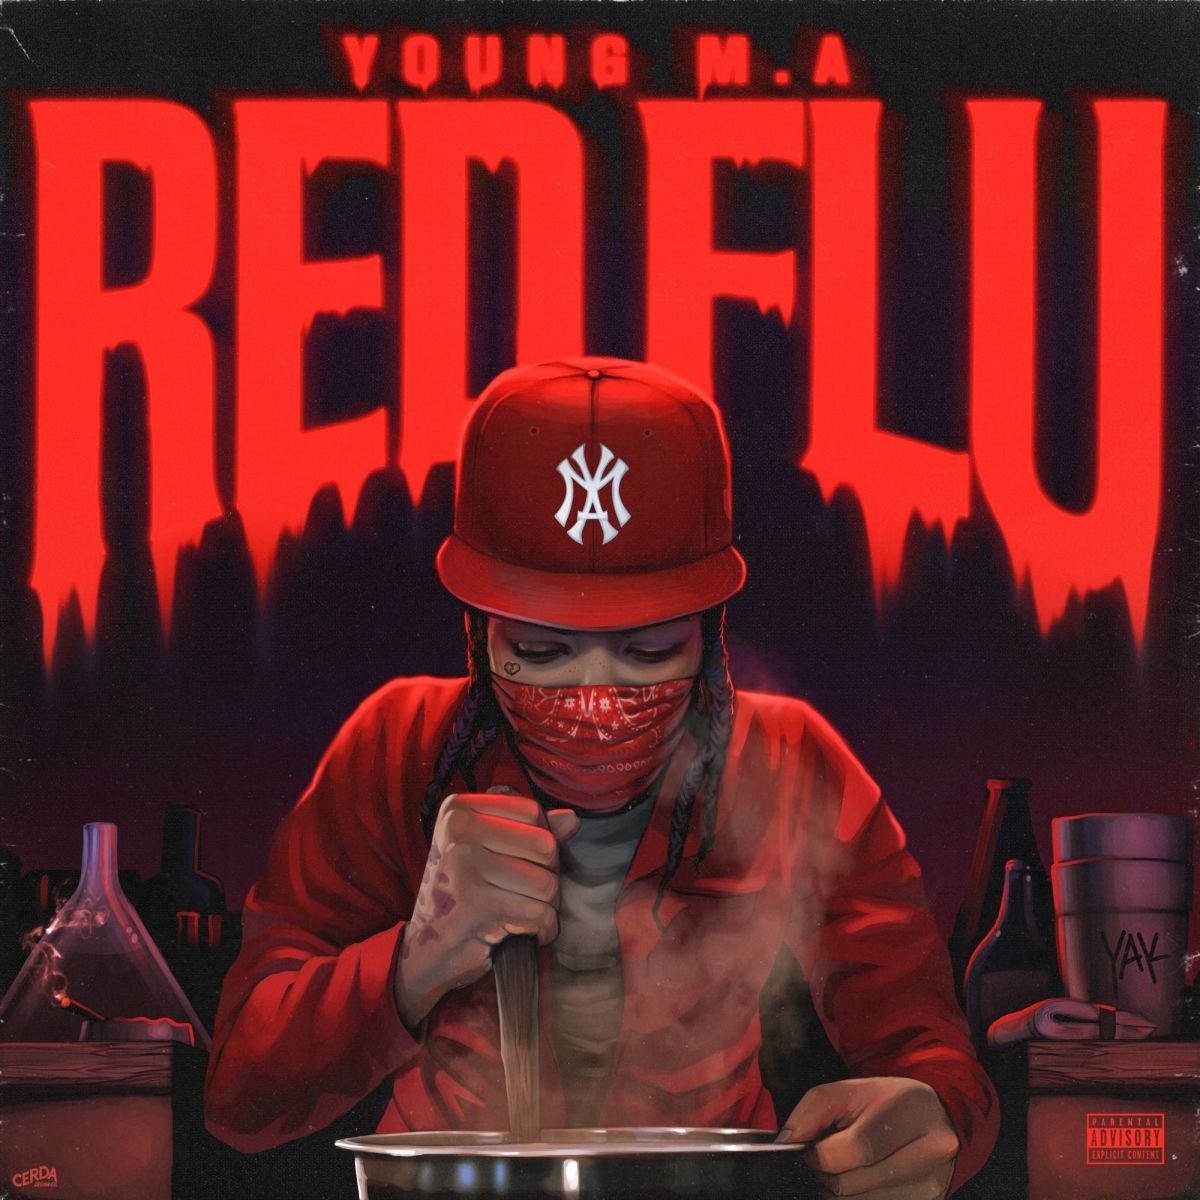 """Redflu"" EP cover art"